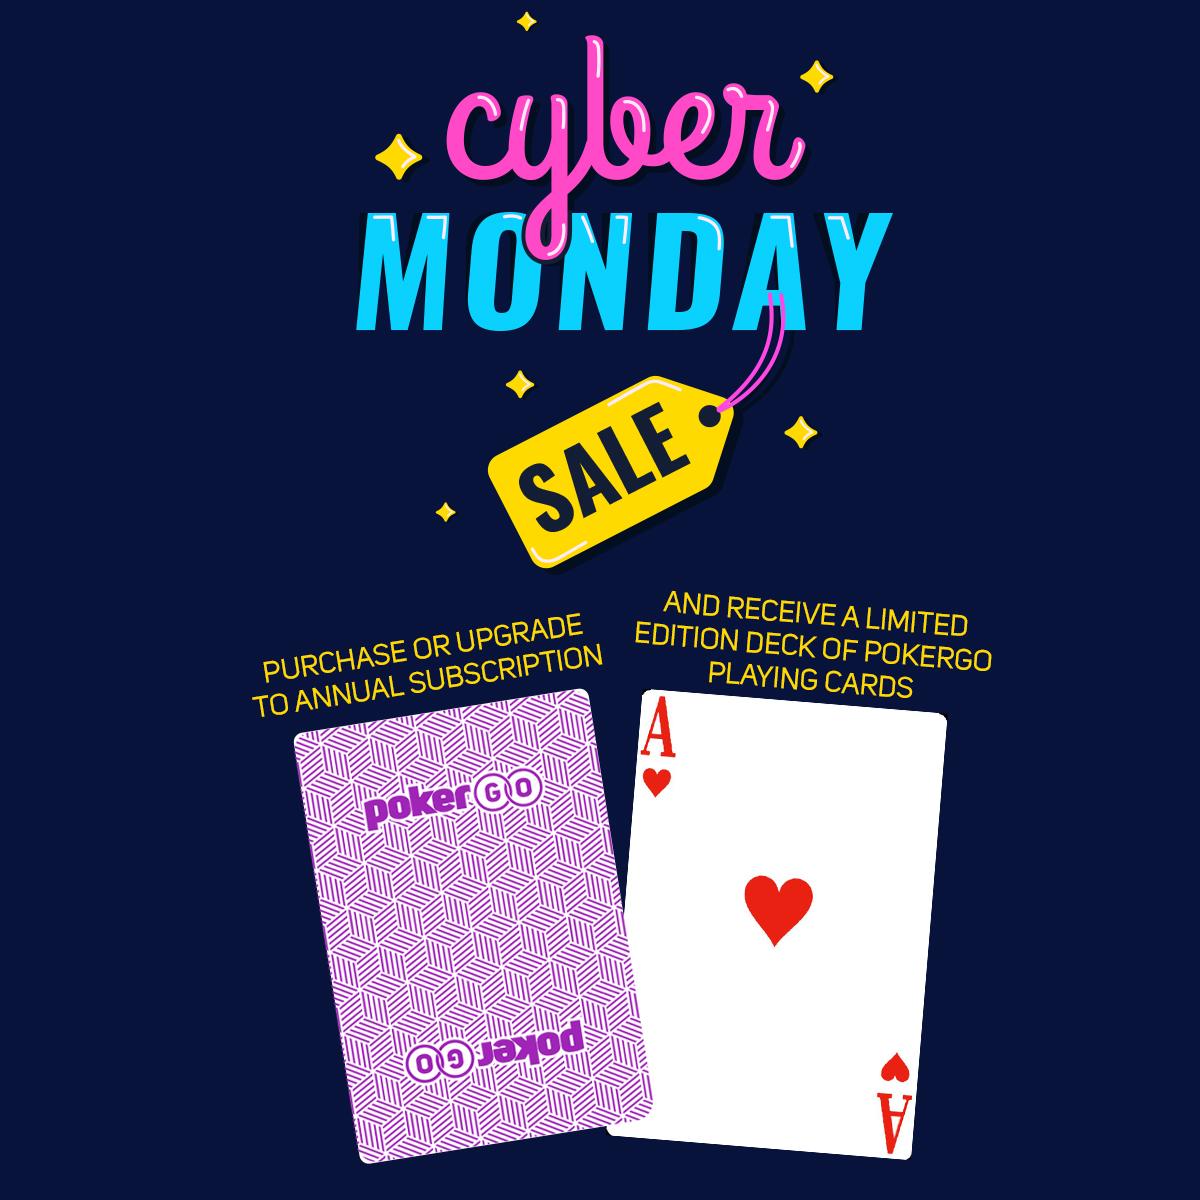 PokerGO Cyber Monday Sale $99